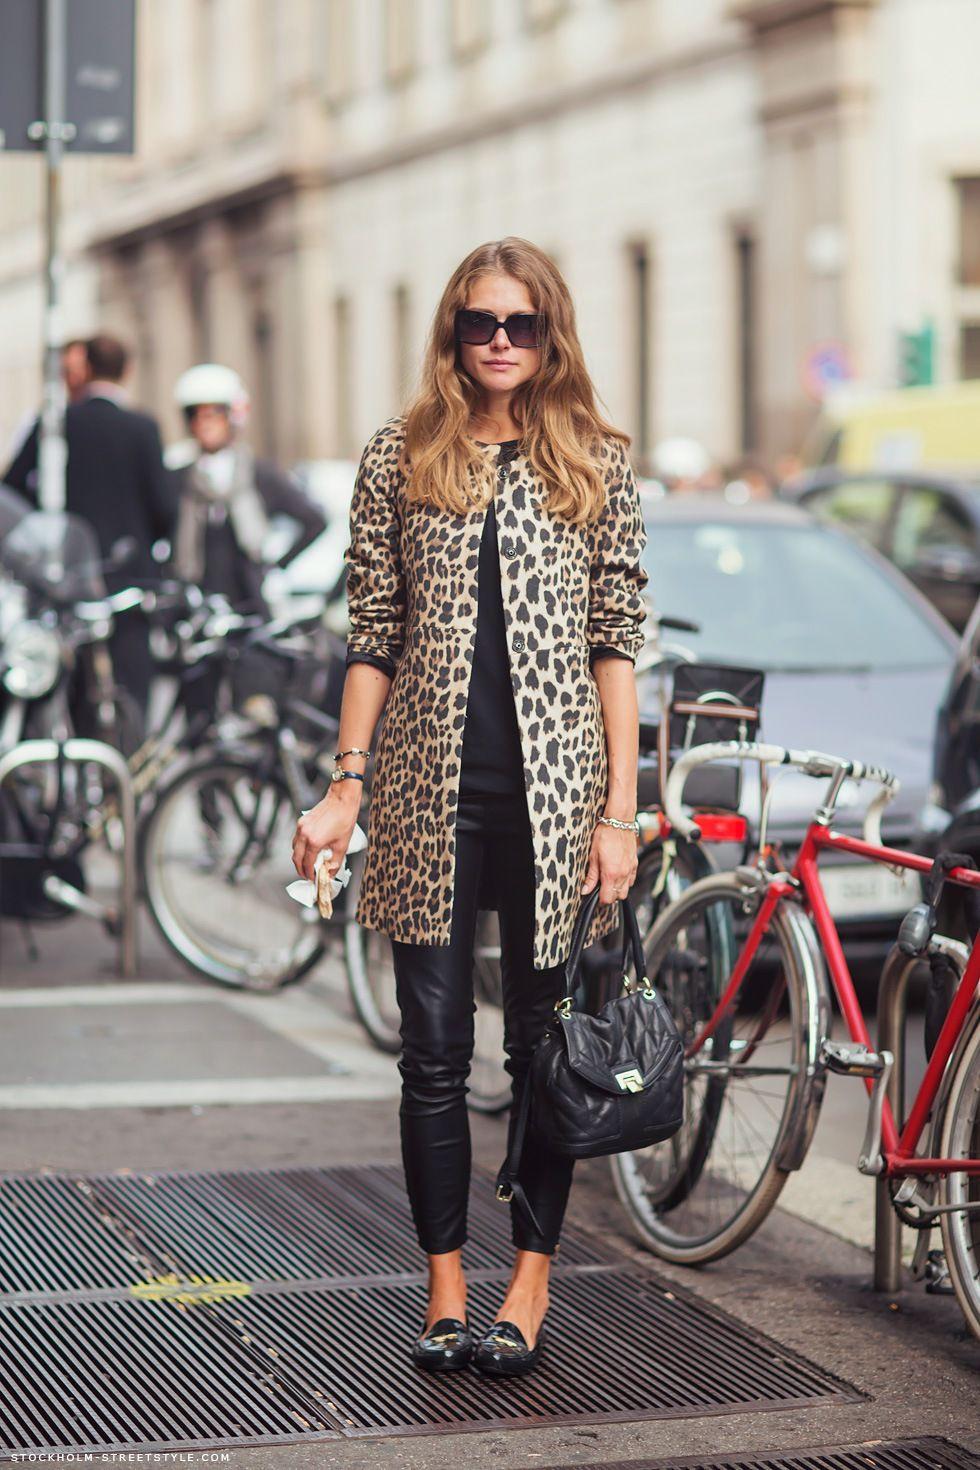 Wearing leopard print coat, Animal print